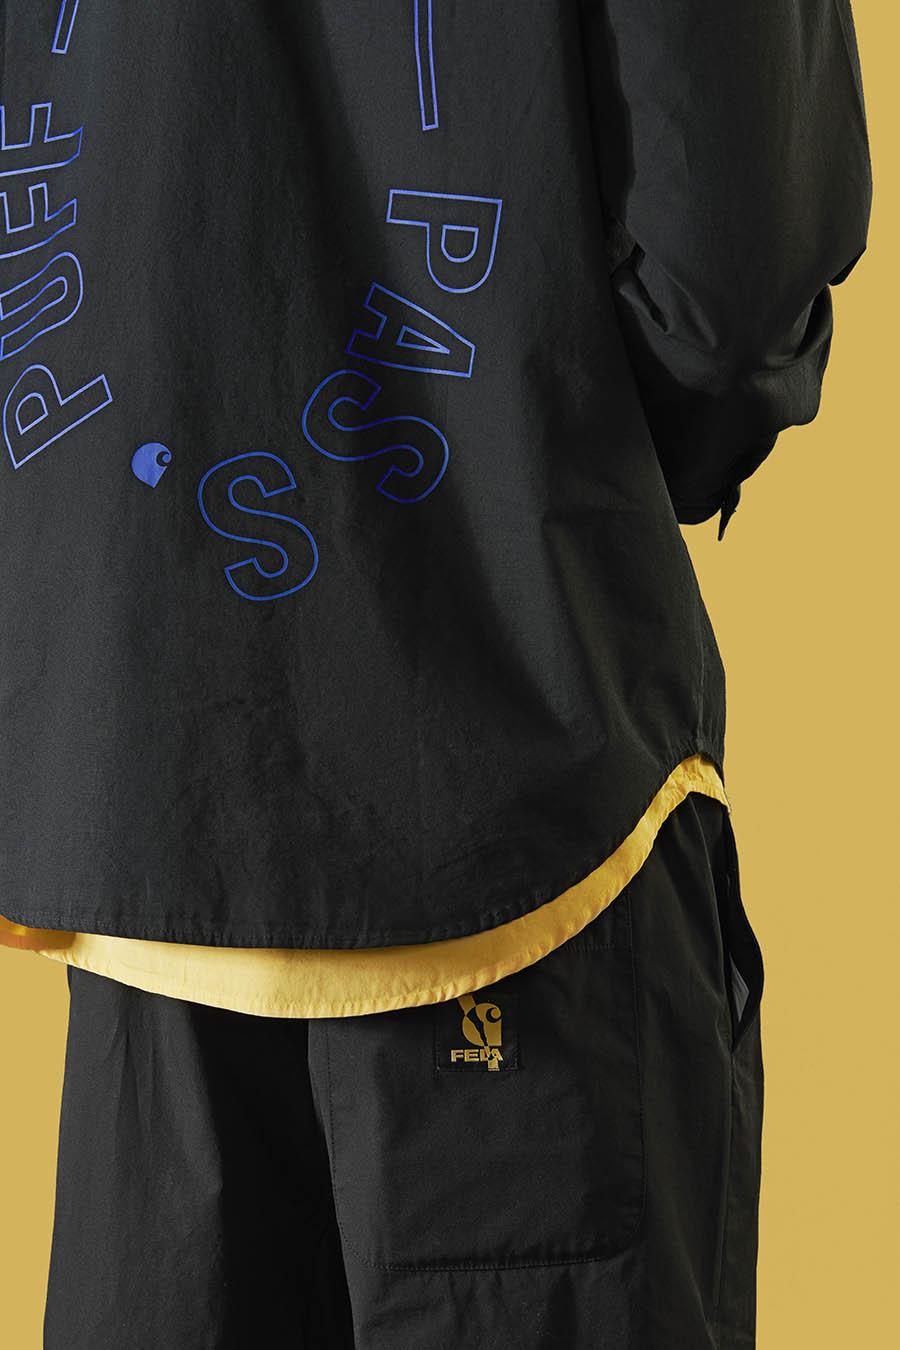 Fela Kuti x Carhartt WIP Capsule Collection